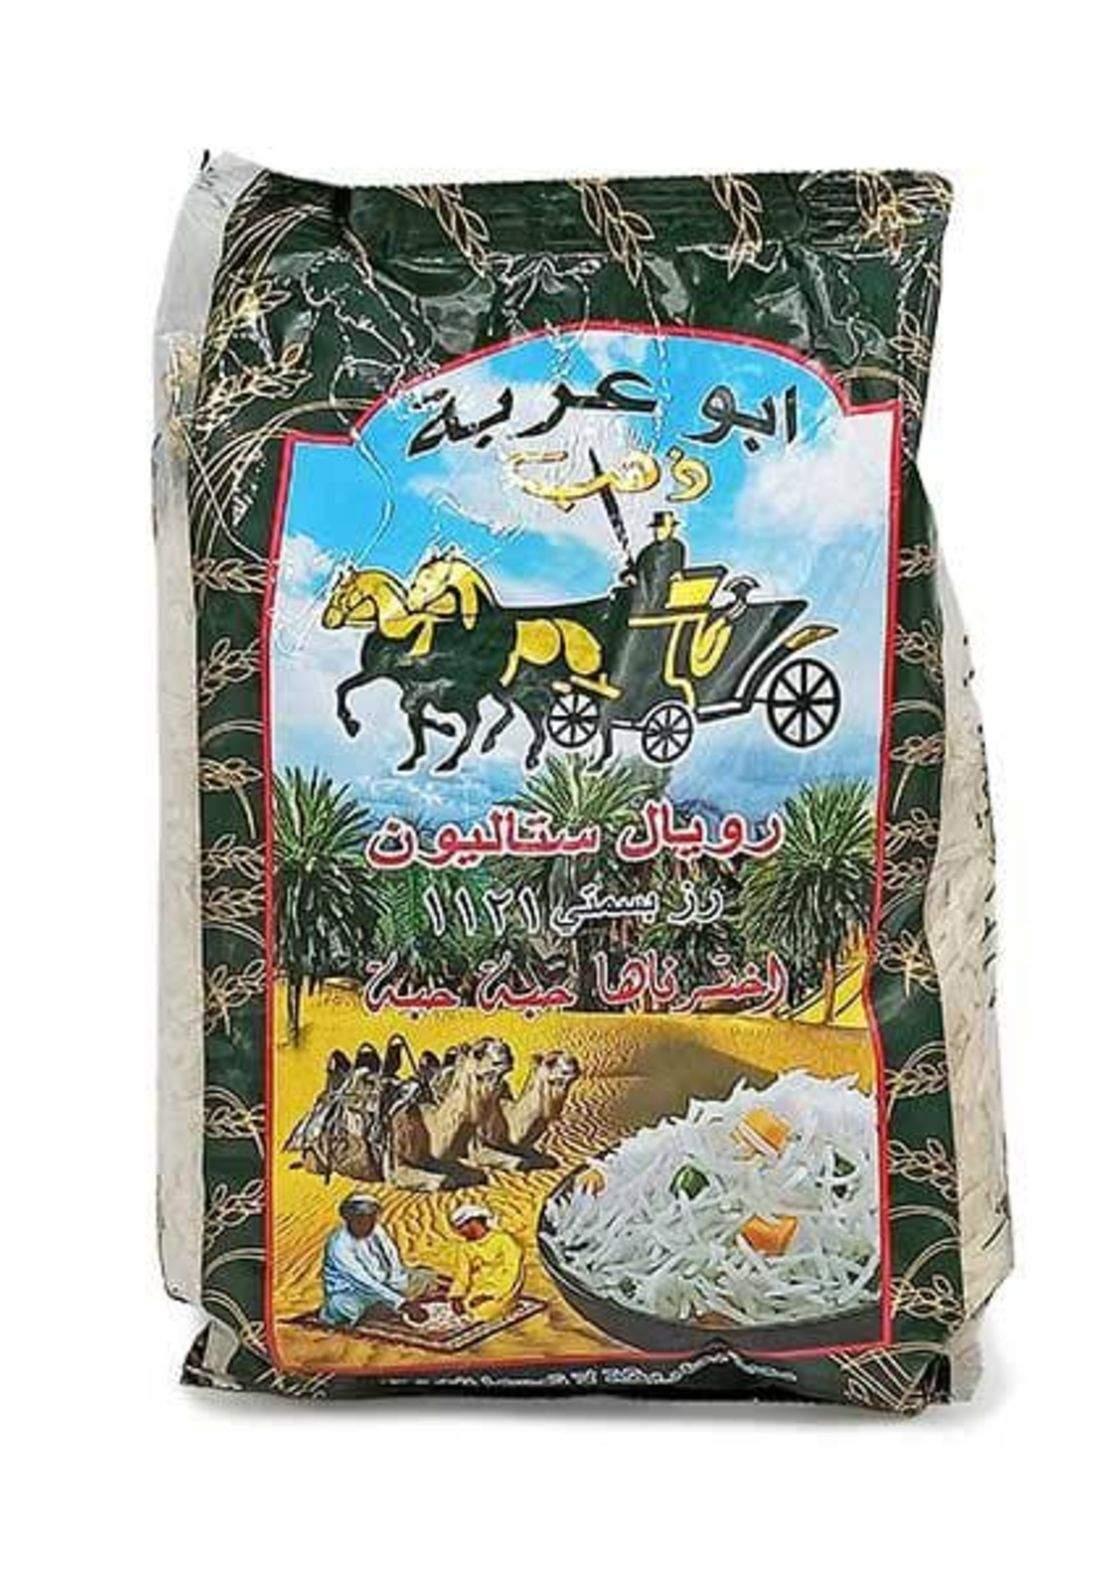 Royal stallion rice 900g رز ابو العربة